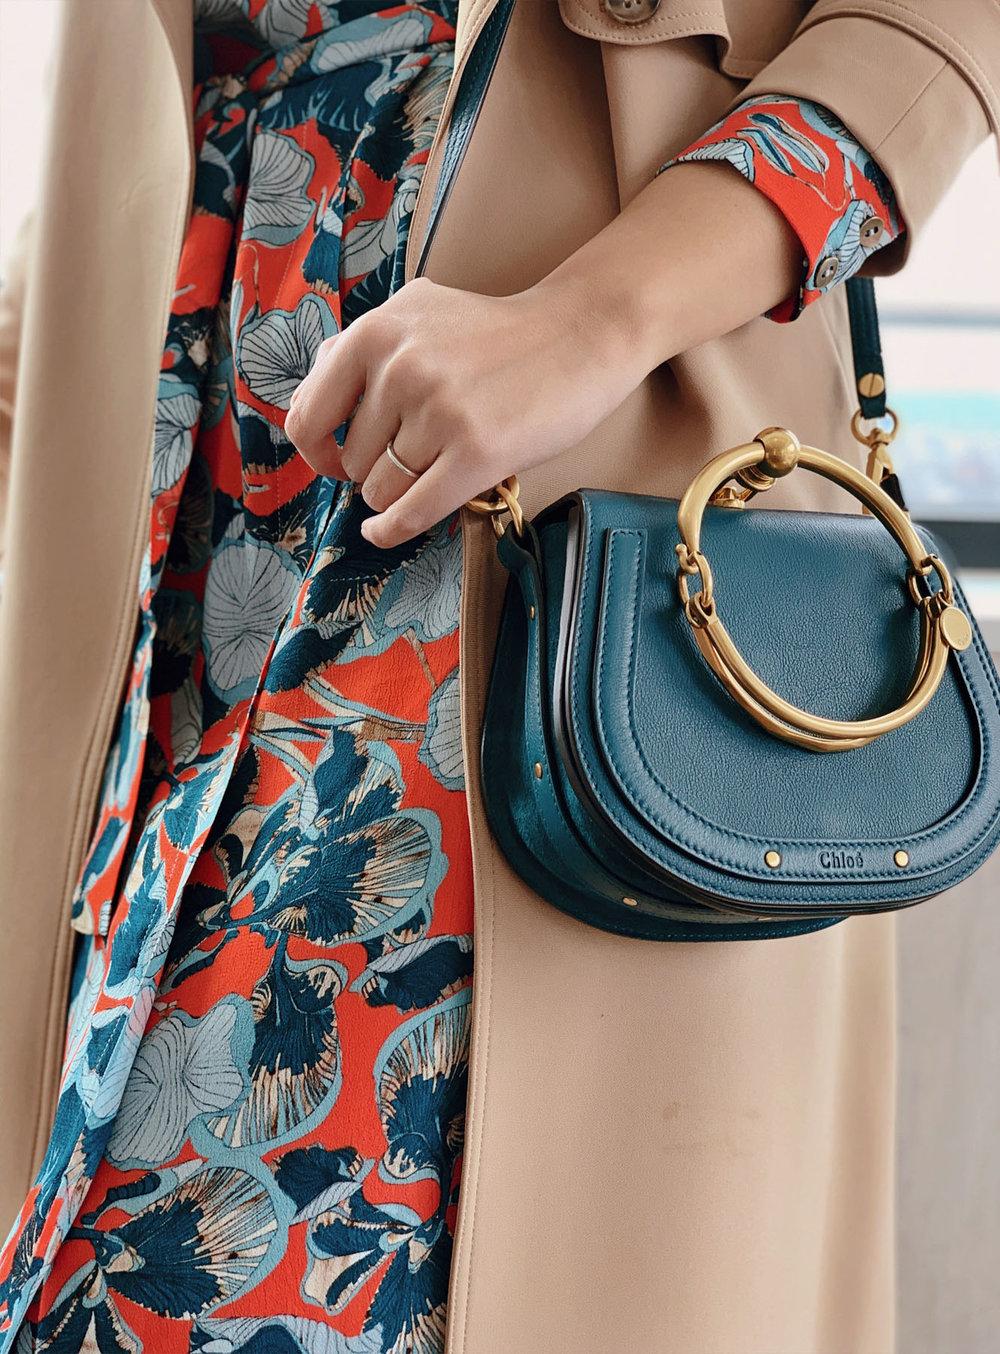 Style Midi Dress For Early Spring - Chloe Nile Bag